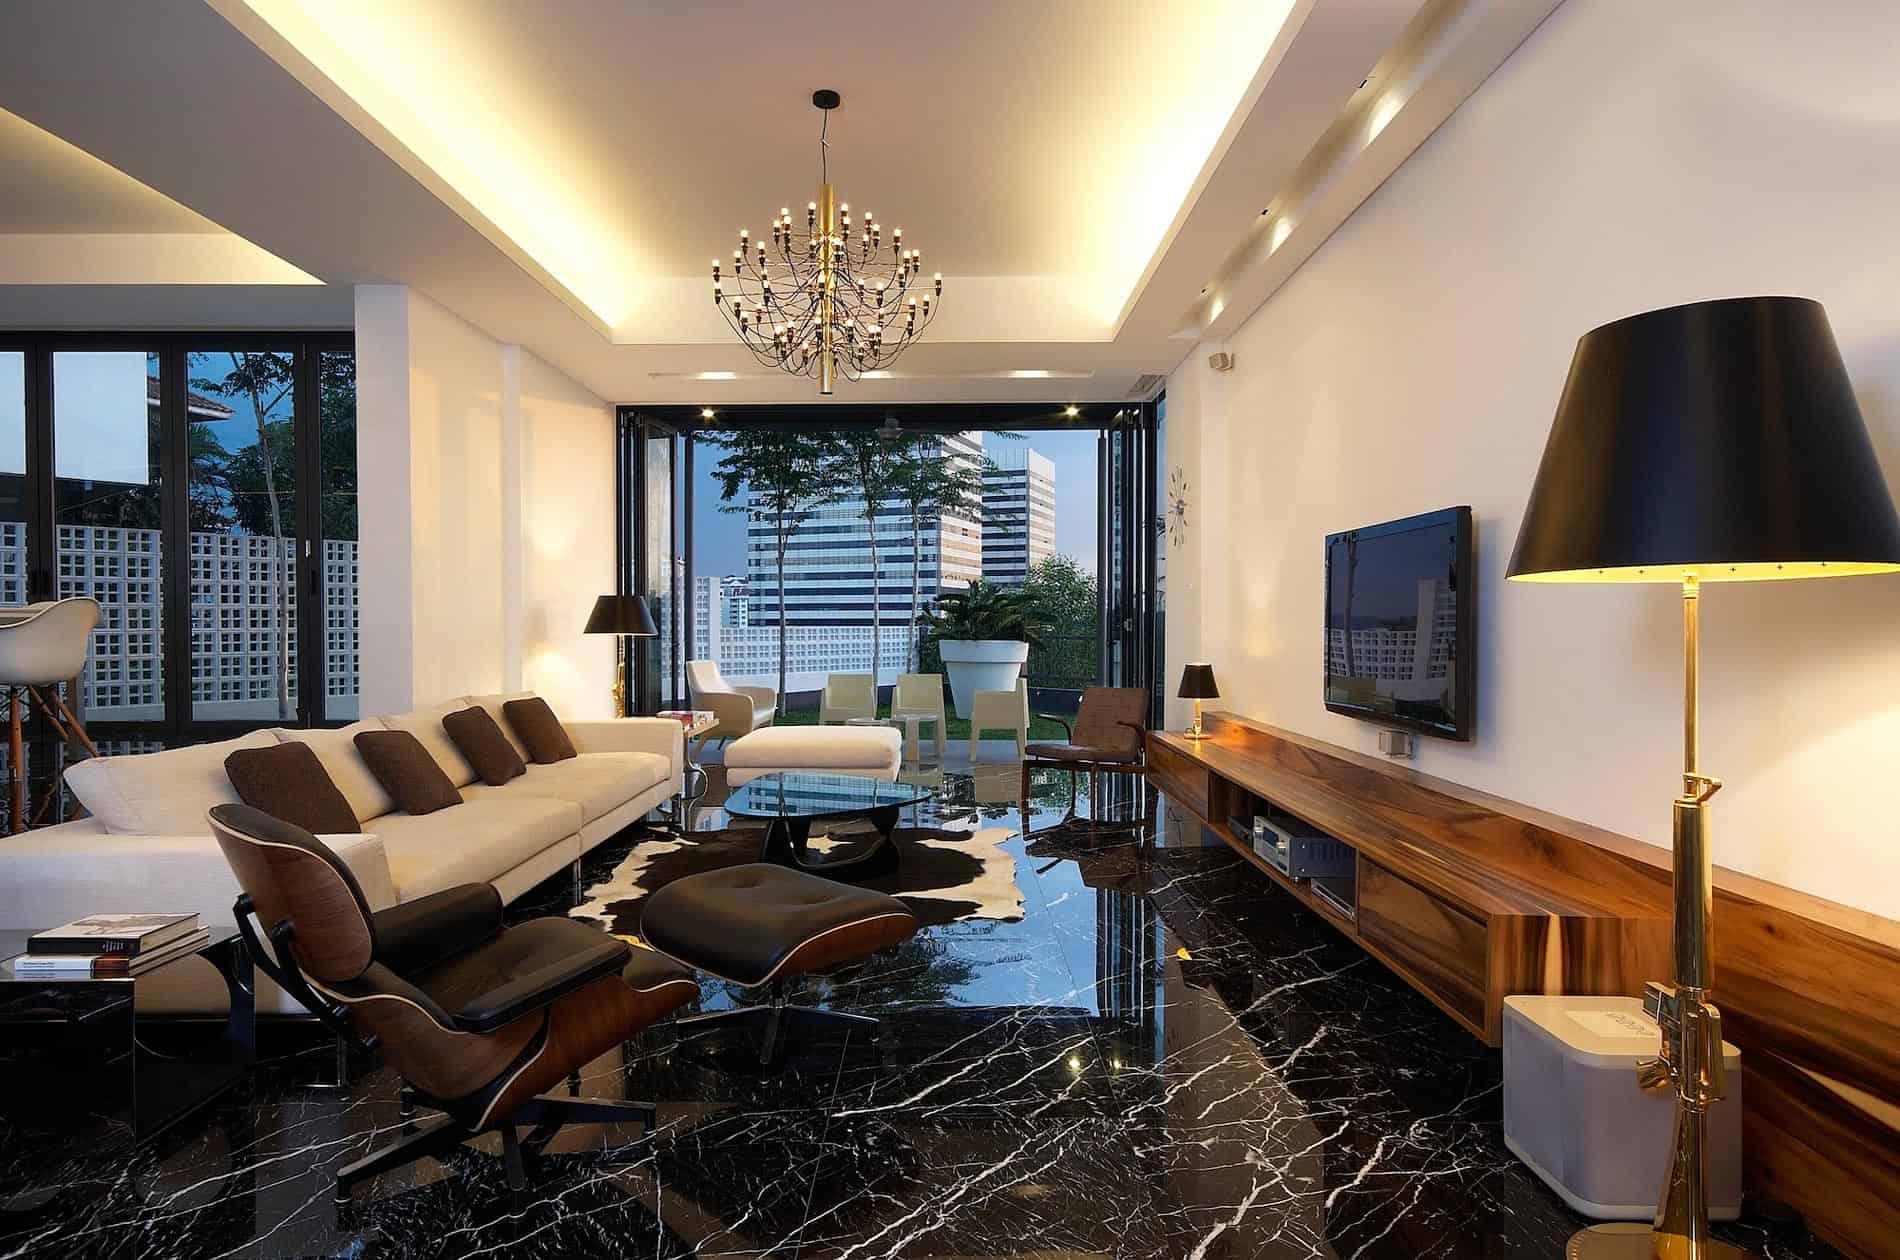 Hillside Bungalow Remodel by Interlink Design Solutions (8)